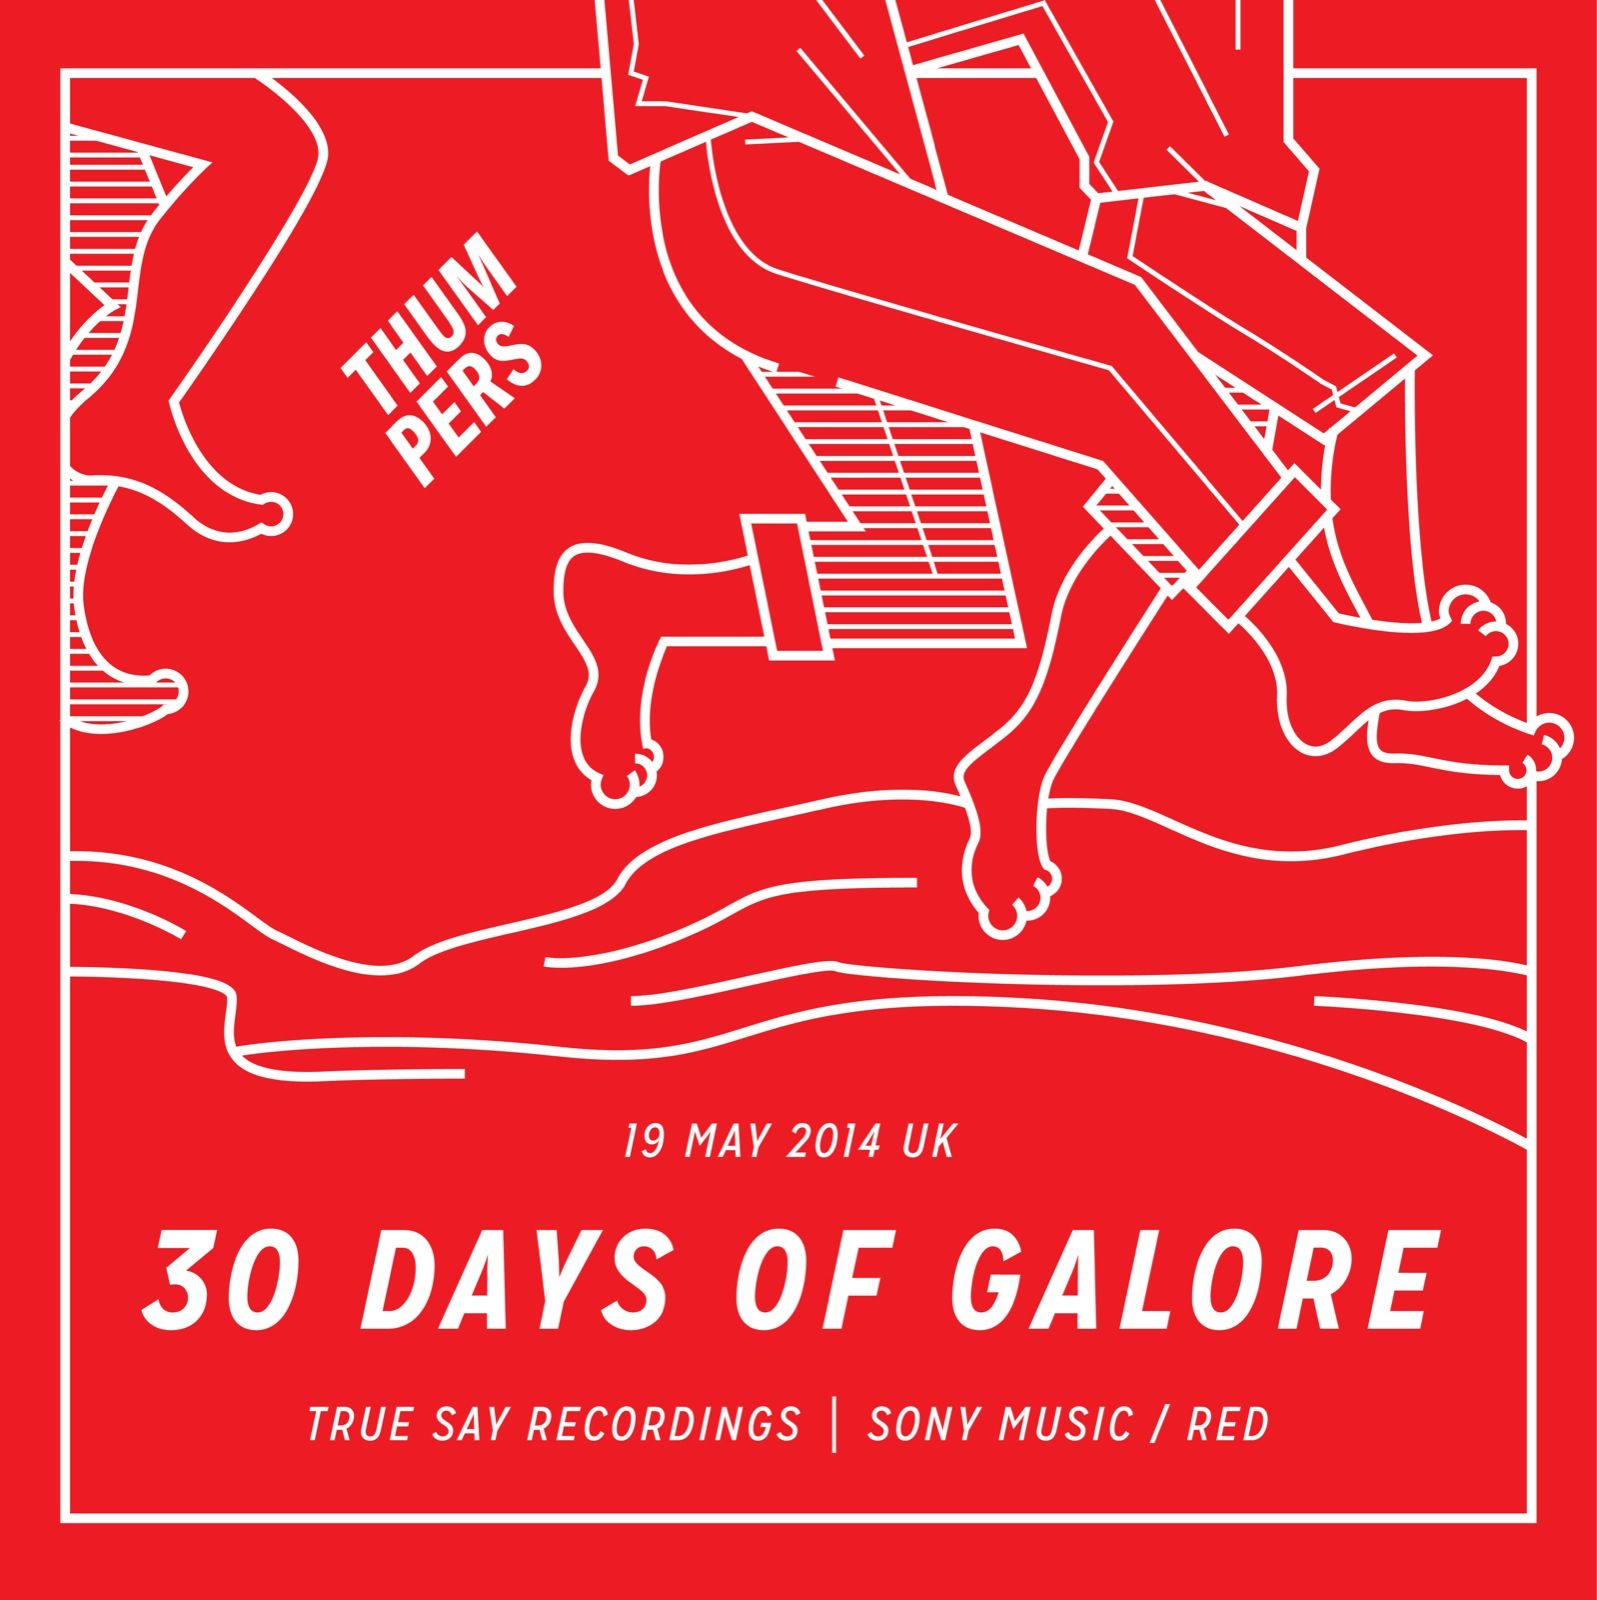 Alternate reverse-color version of 04 #30daysofgalore #thumpers #galore #ukmusic #music #typography #design & #illustration